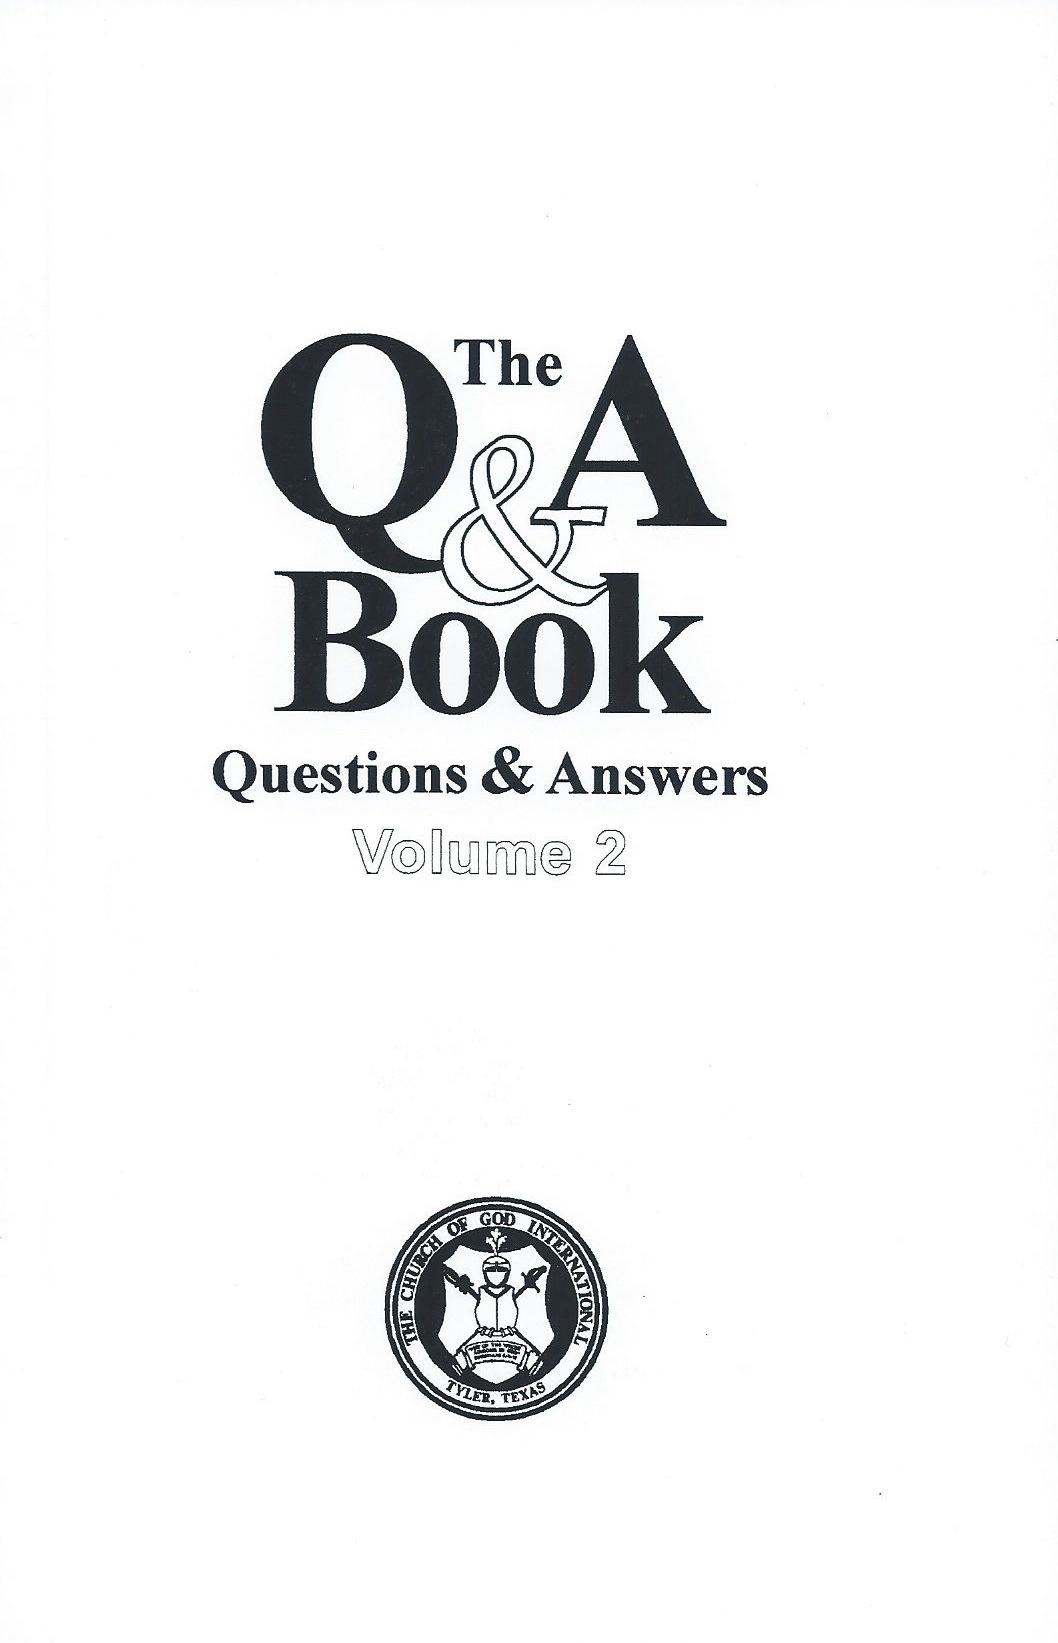 Literature — The Church of God International